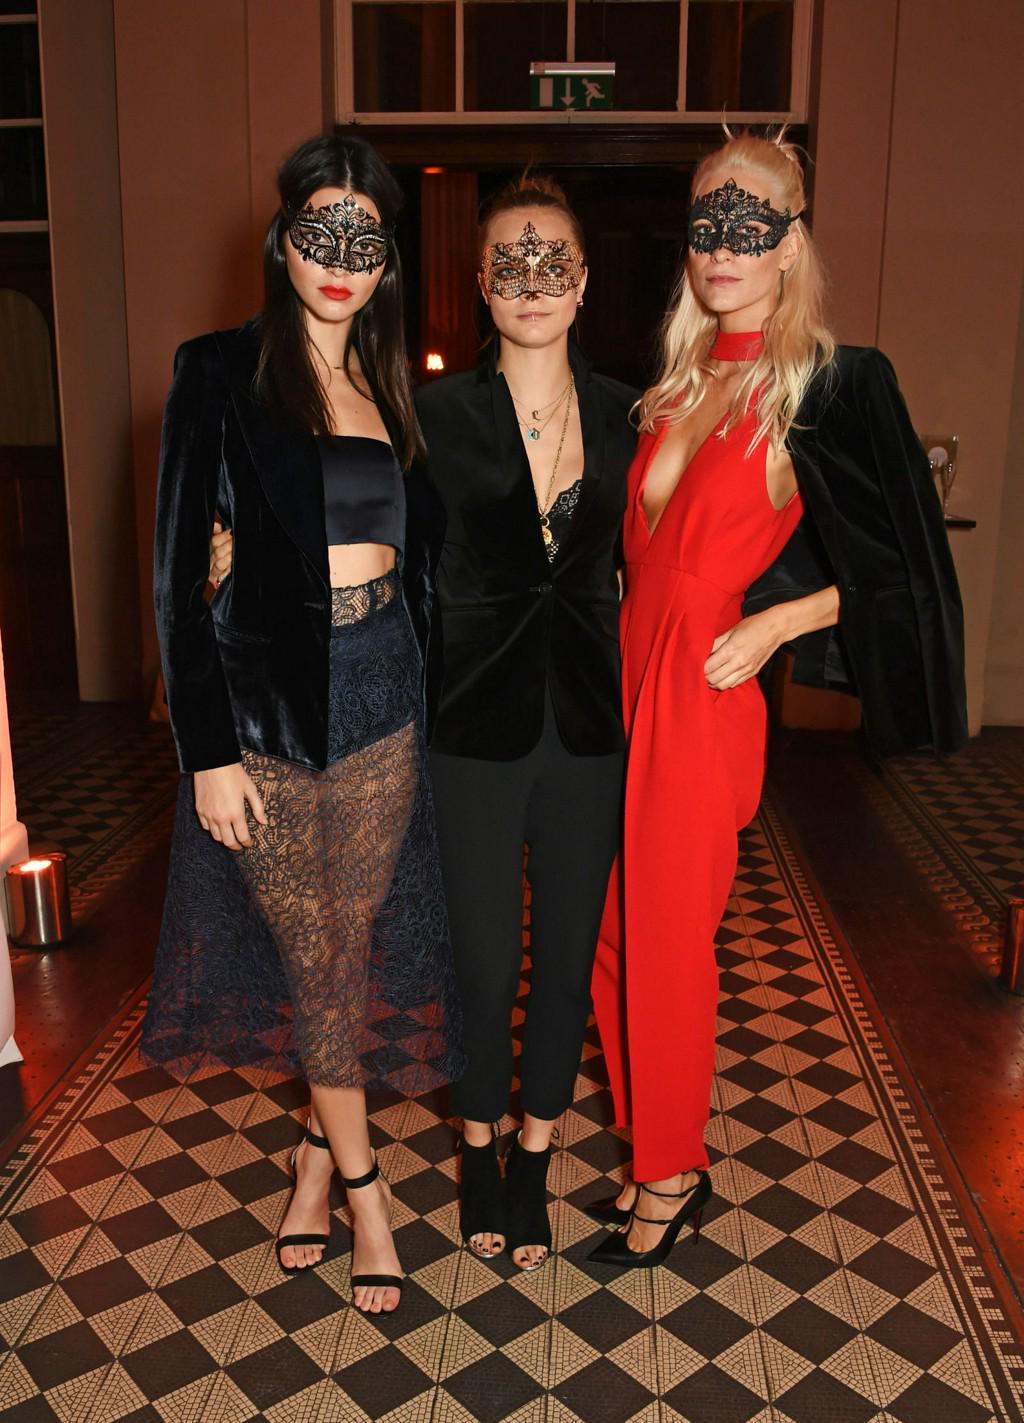 Kendall Jenner's Best Looks http://t.co/PJgQwvNWH3 http://t.co/z9icmoRnLT